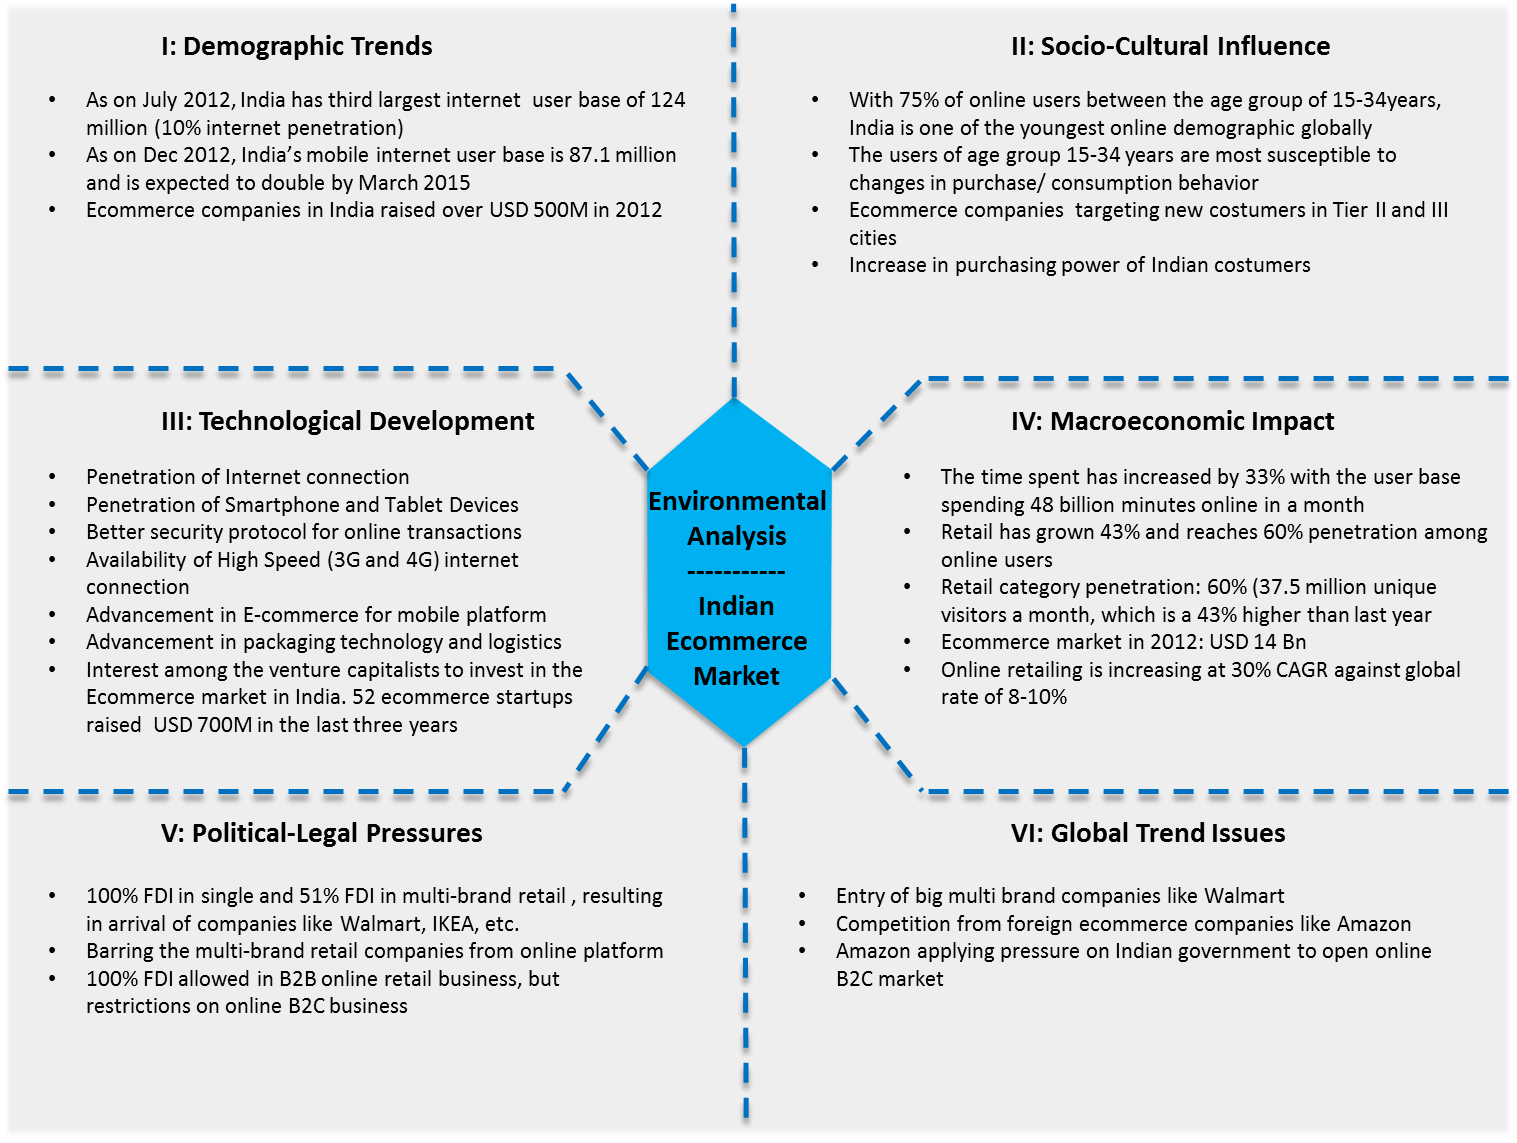 swot analysis of flipkart com Includes : about the company : flipkart acquisitions challenges faced by the company swot analysis marketing strategy used flipkart's success mantra  marketi.